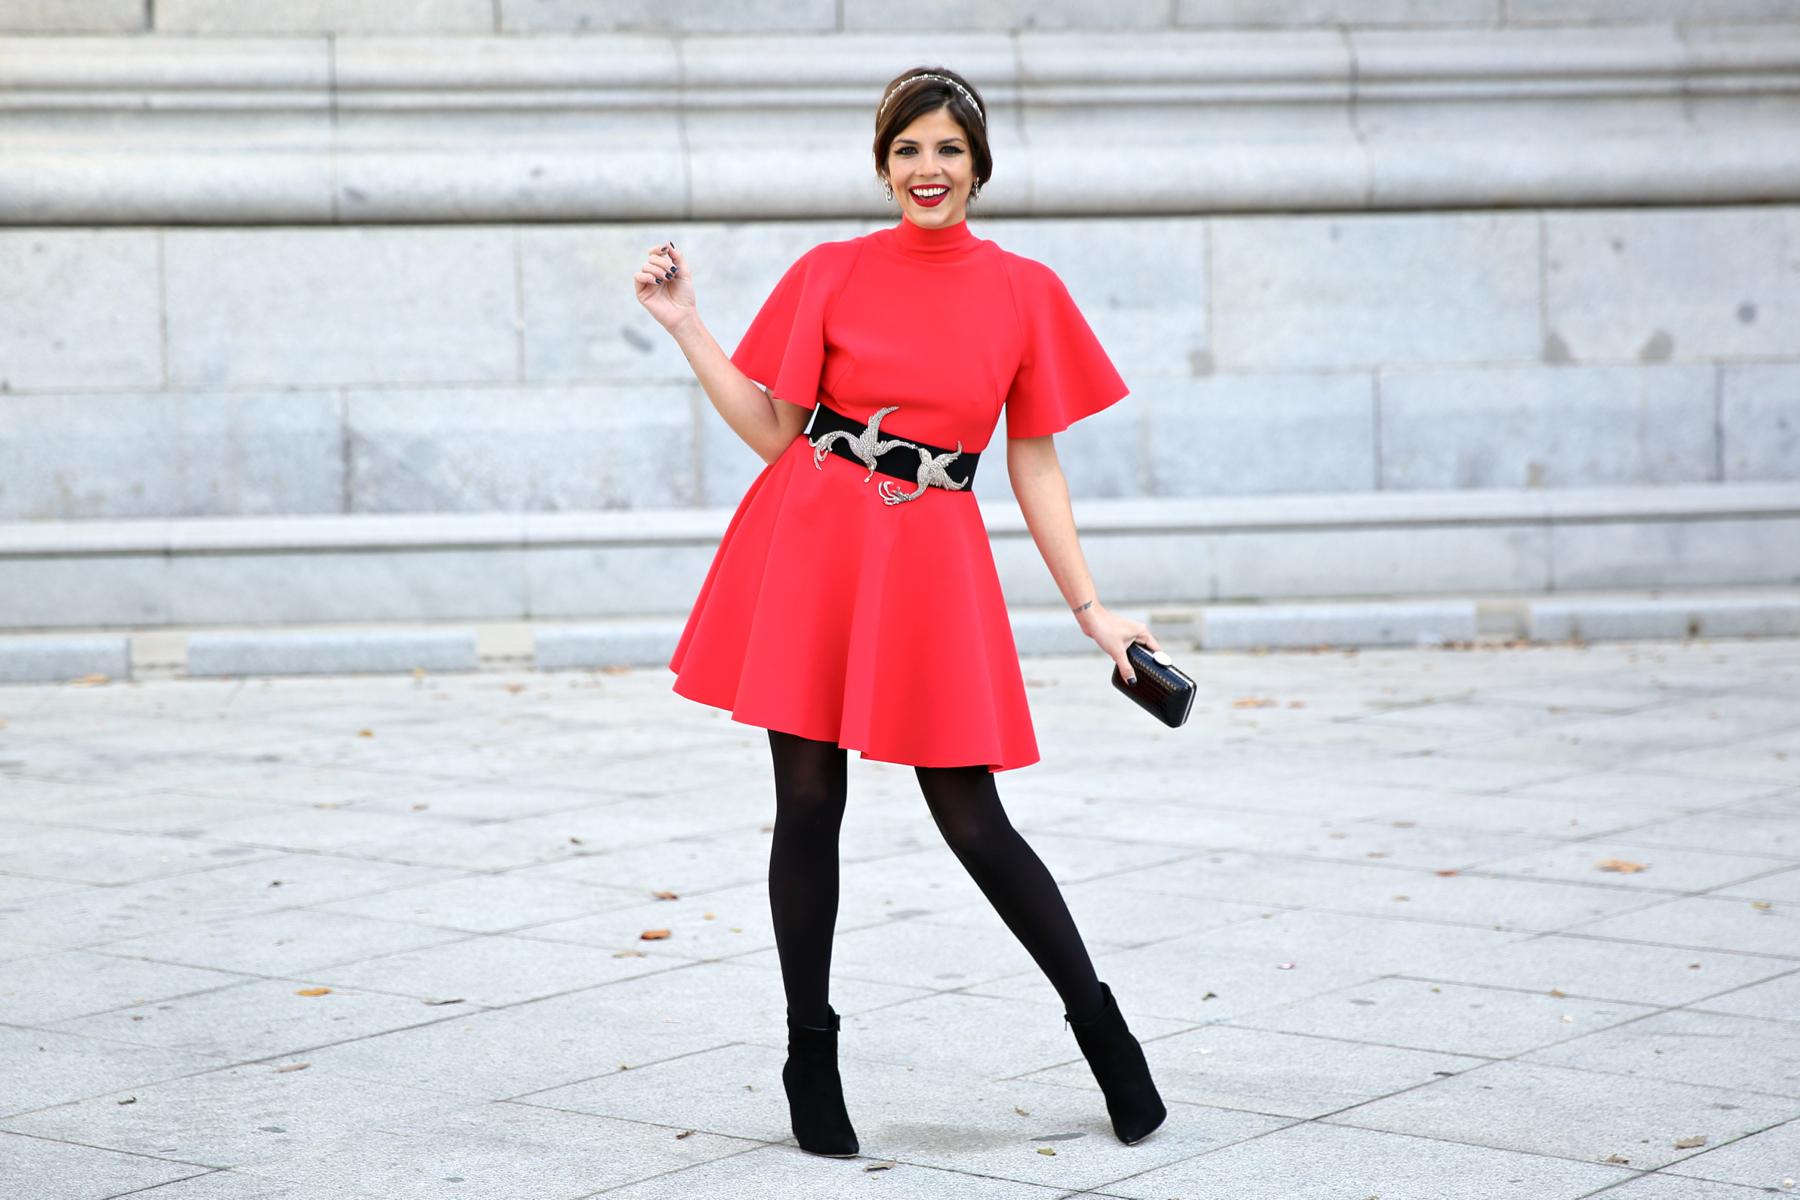 trendy_taste-look-outfit-street_style-ootd-blog-blogger-fashion_spain-moda_españa-vestido_fiesta-24fab-11